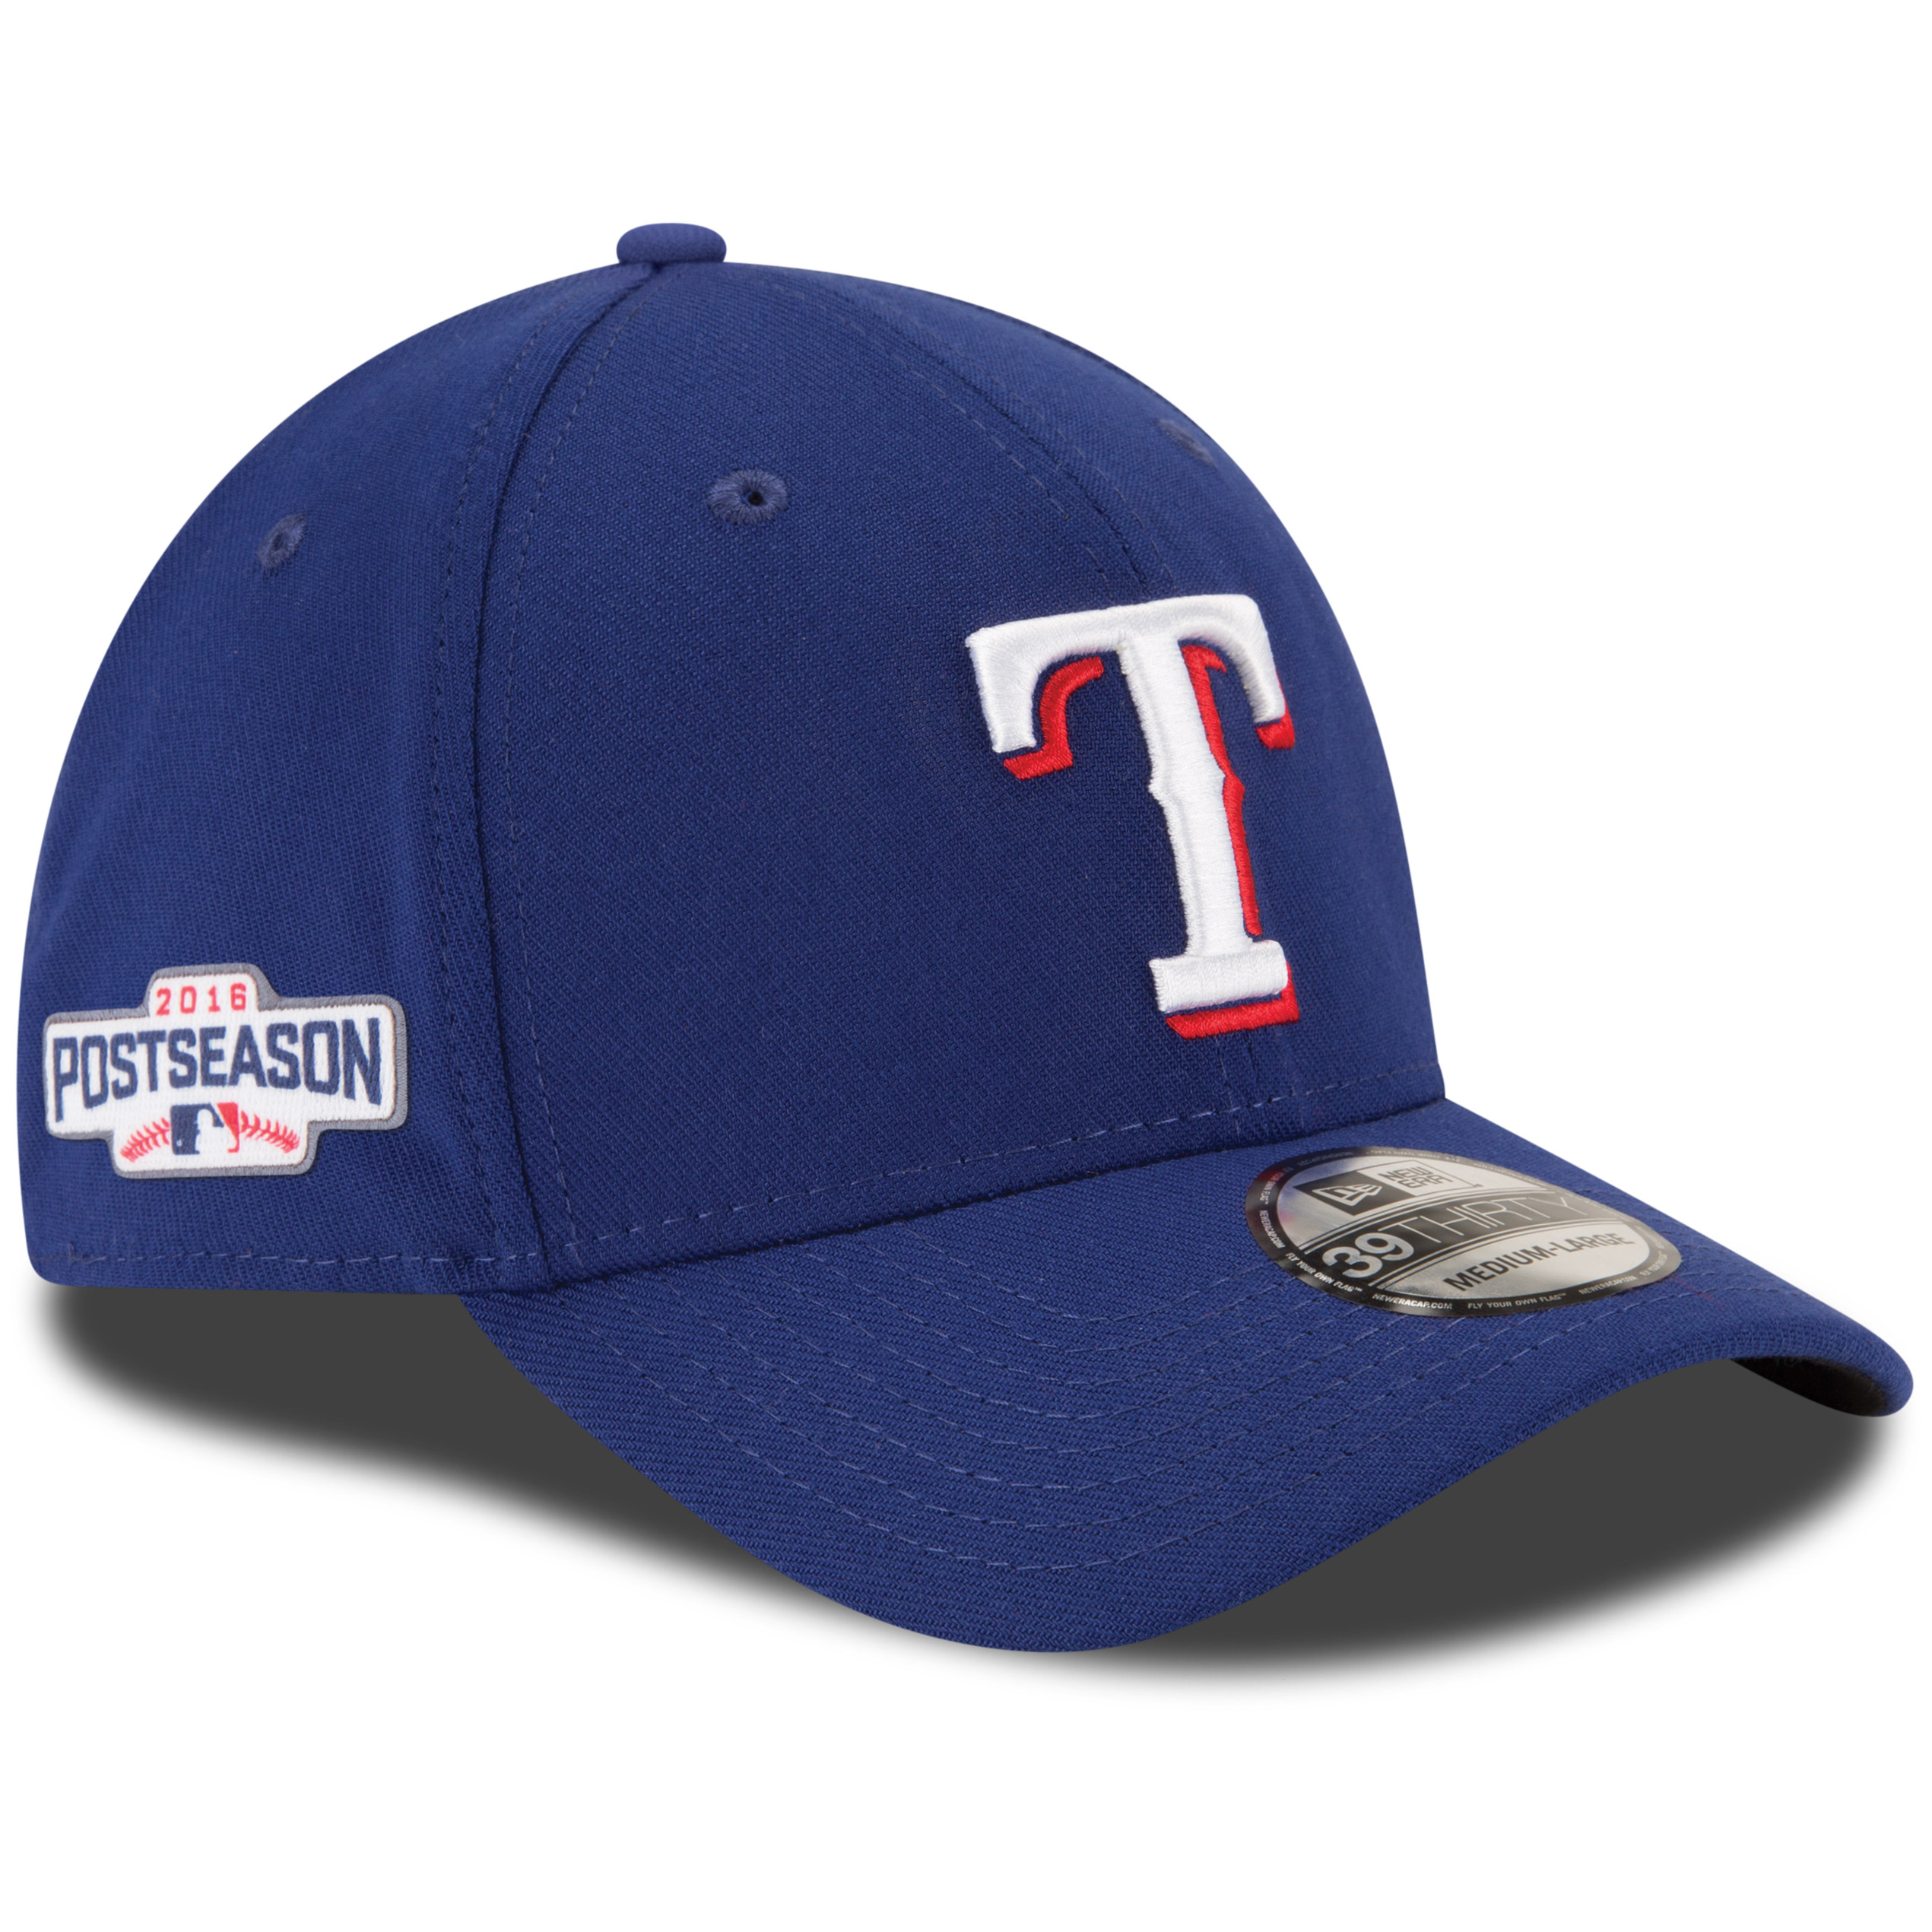 Texas Rangers New Era 2016 Postseason Side Patch 39THIRTY Flex Hat - Royal